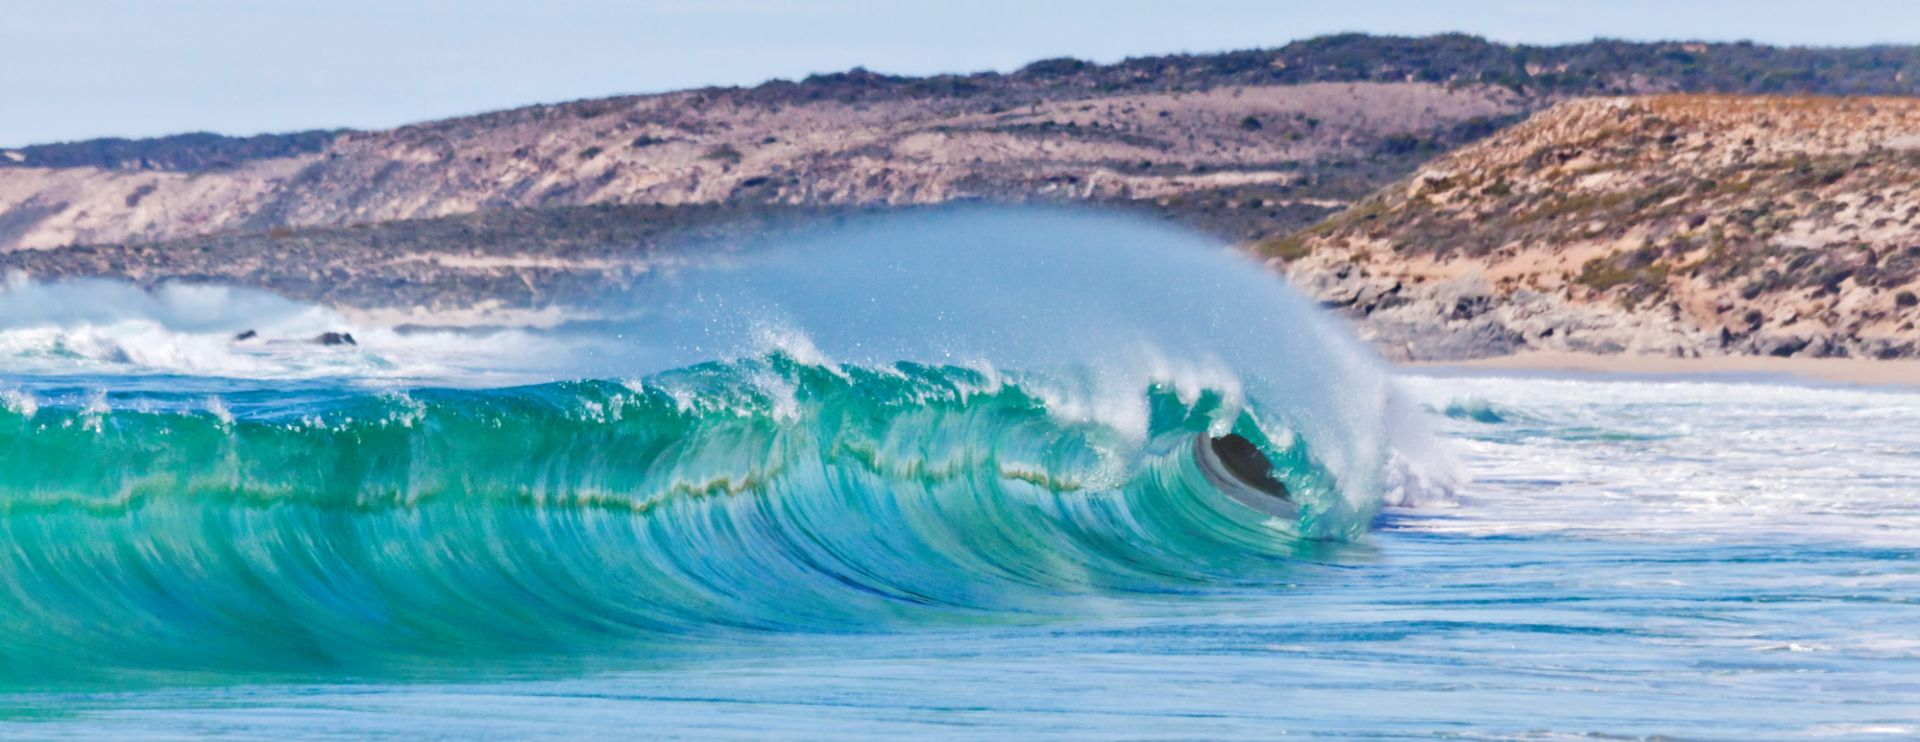 HomaPageBanner_Image_Surf